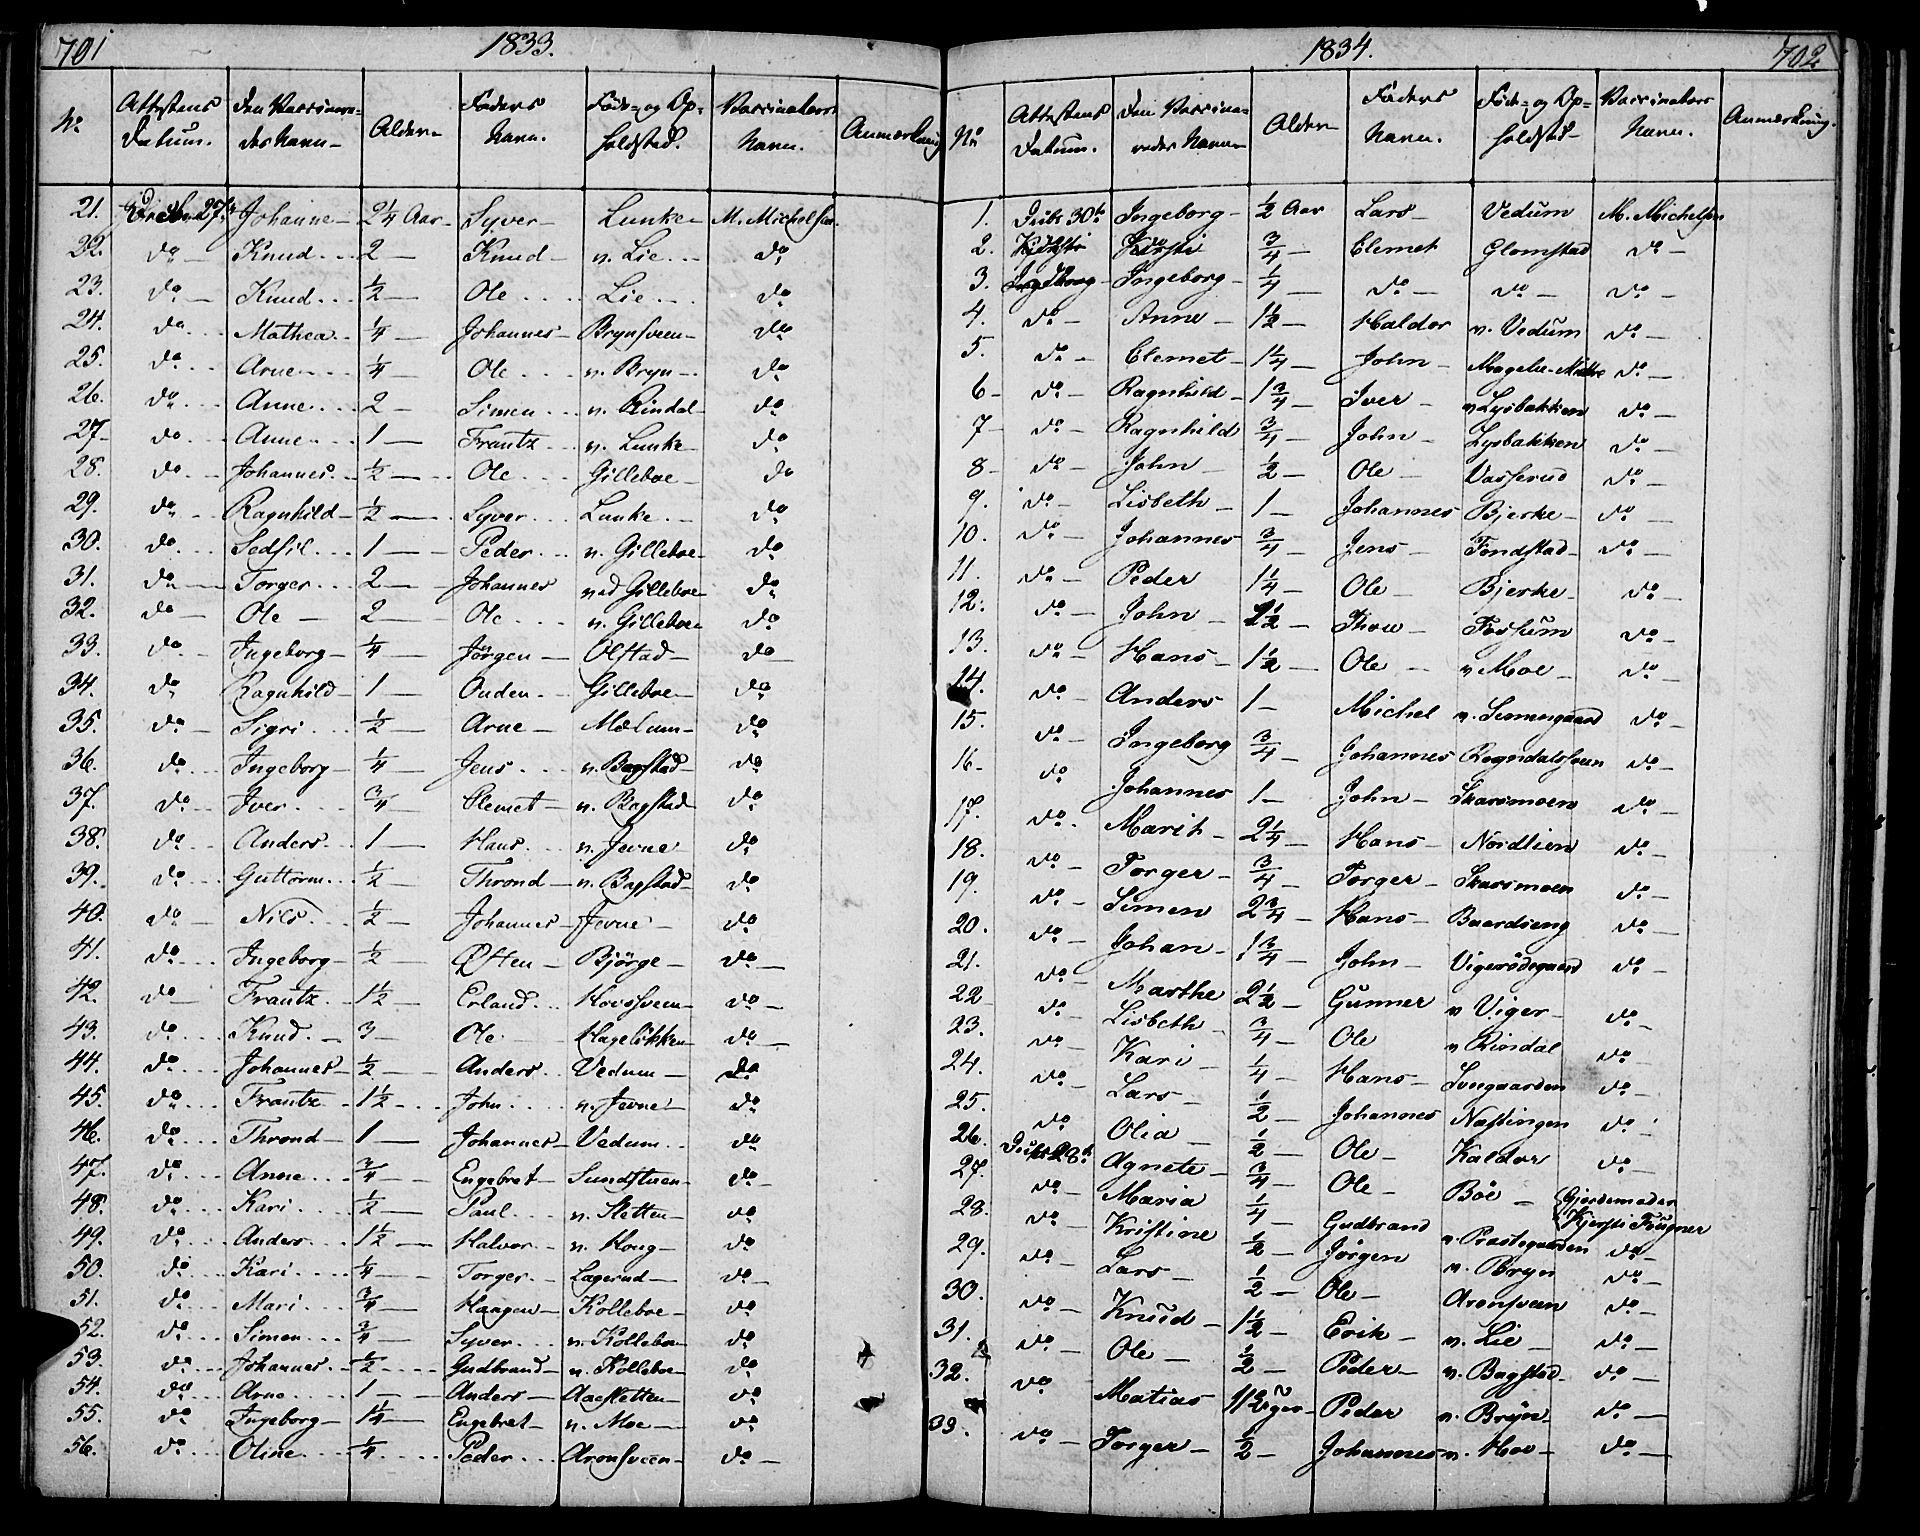 SAH, Øyer prestekontor, Ministerialbok nr. 4, 1824-1841, s. 701-702